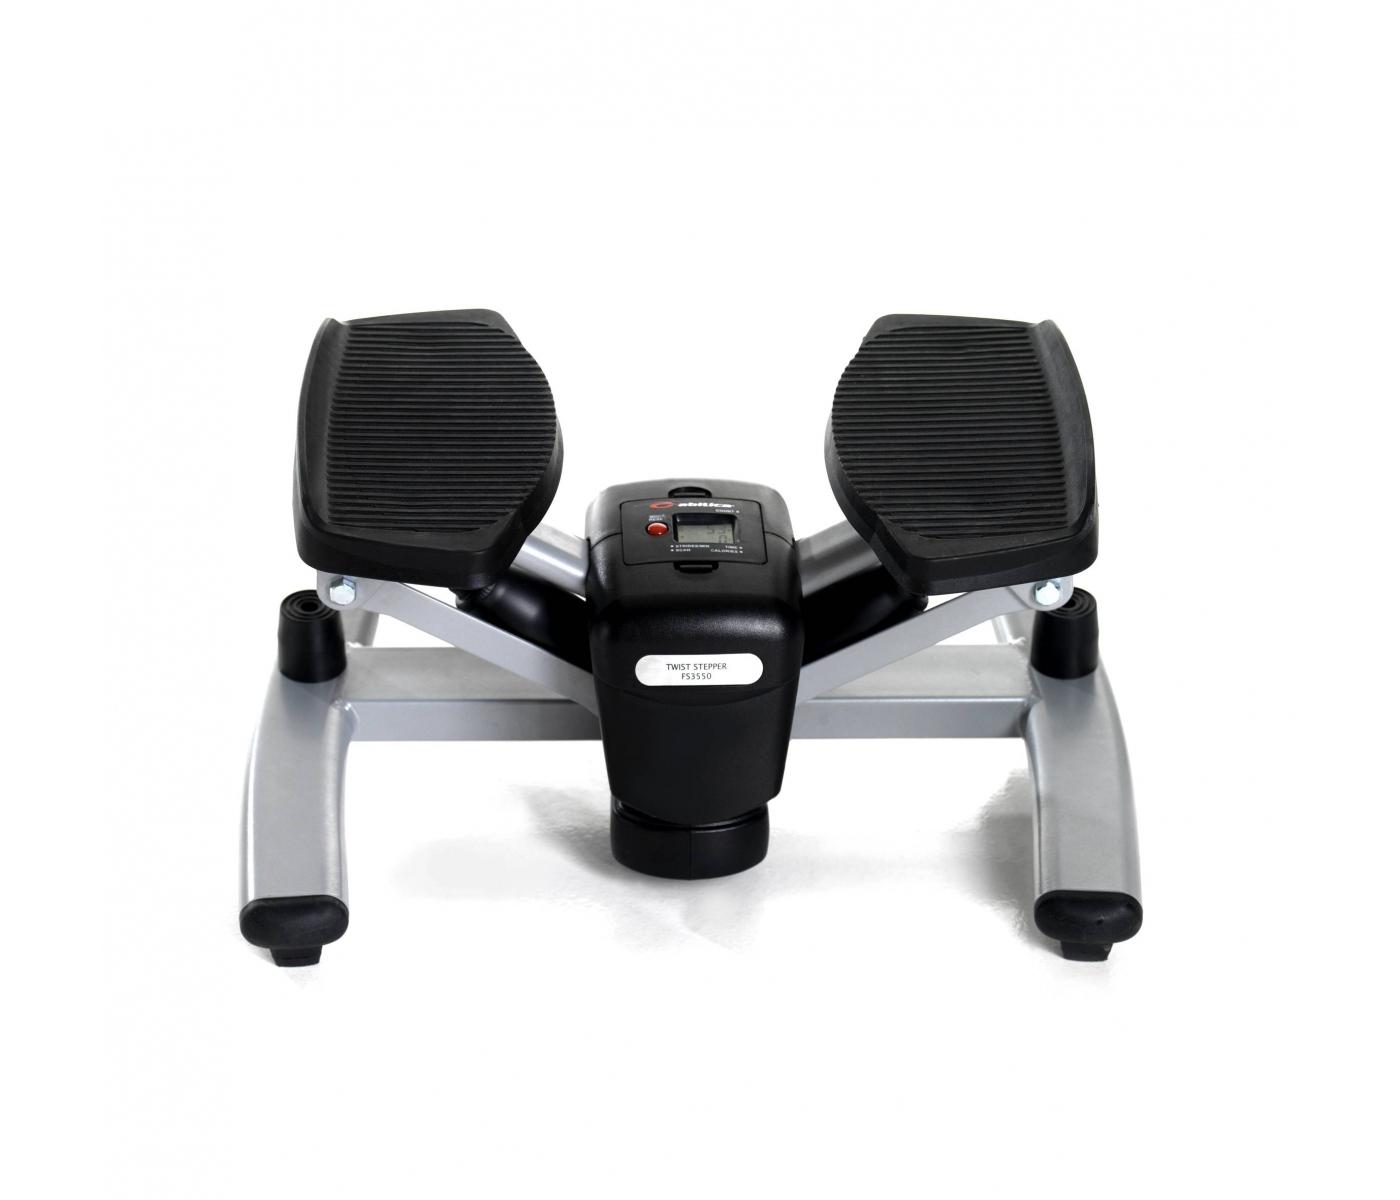 Abilica CoreStep360 stepmaskine